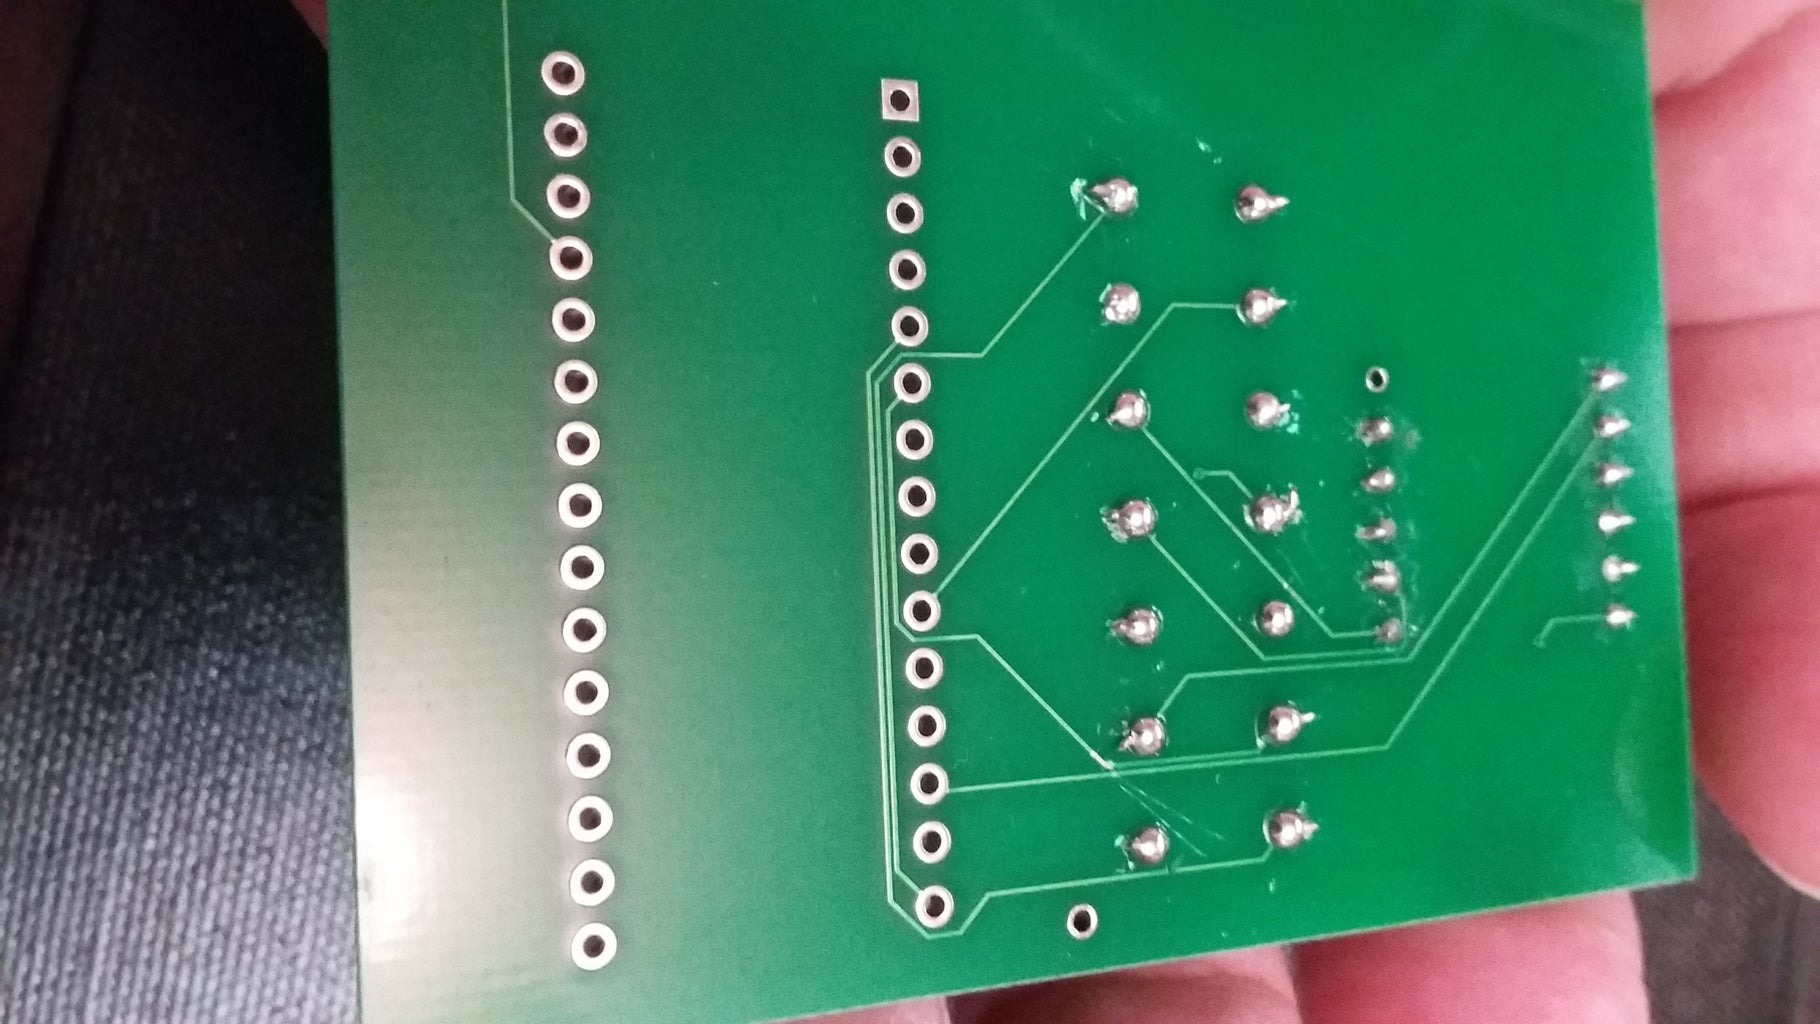 Insert the Resistors of 470 Ohm & 10K